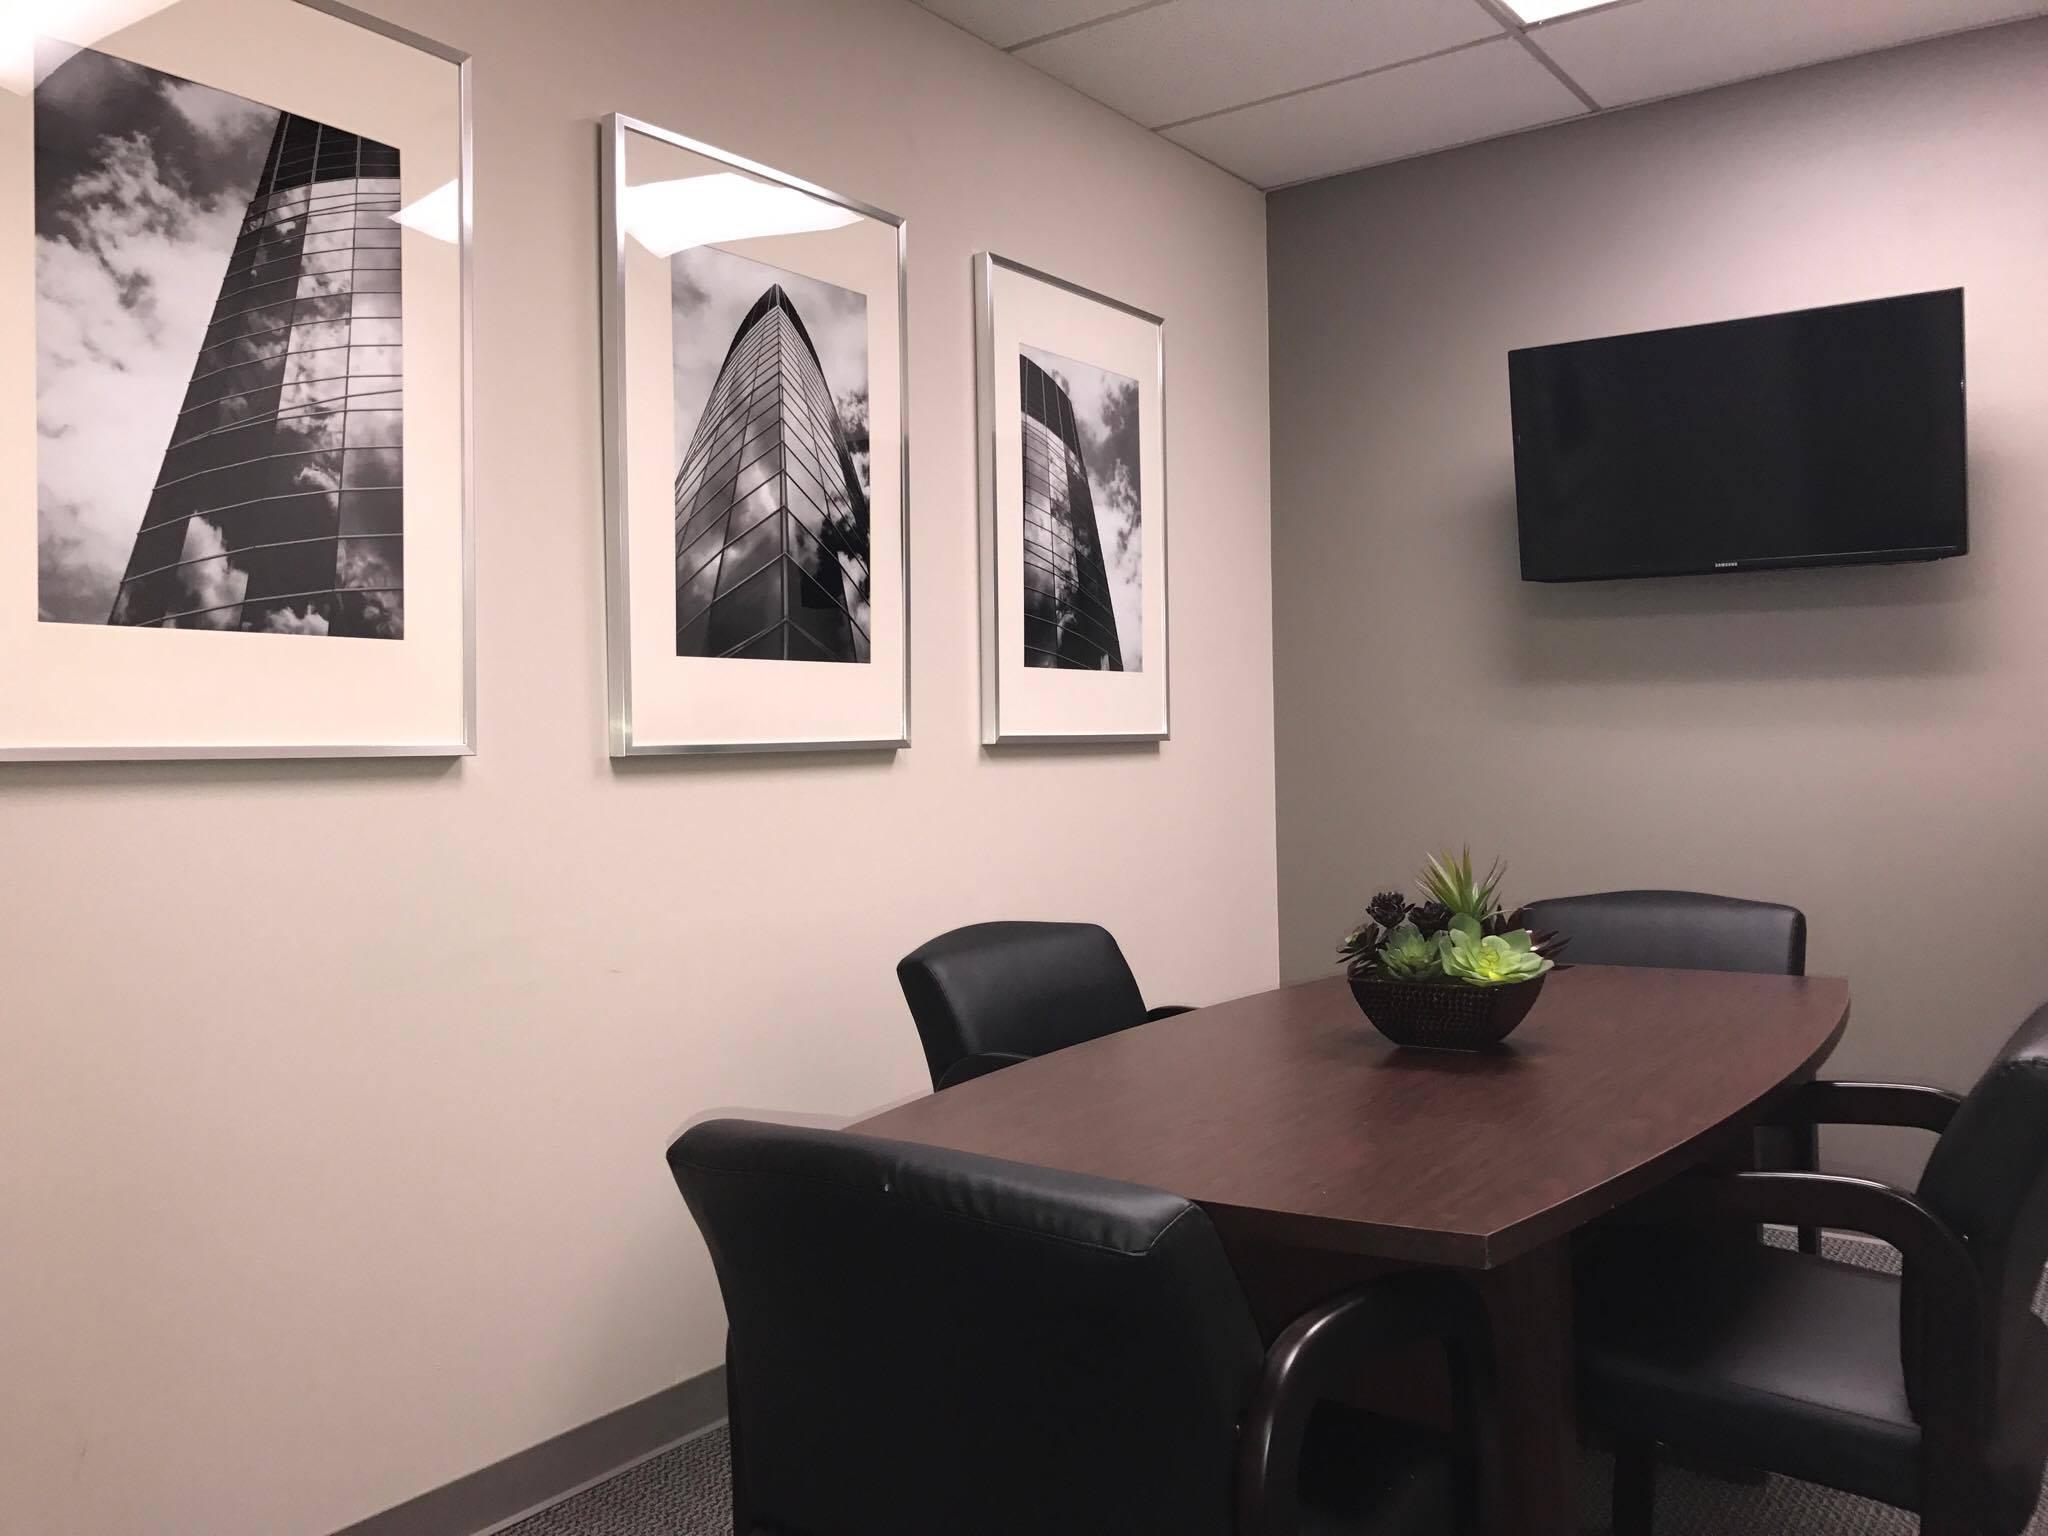 Insurance Services of Washington Inc.   8195 166th Ave NE Ste 202, Redmond, WA, 98053   +1 (425) 868-1123